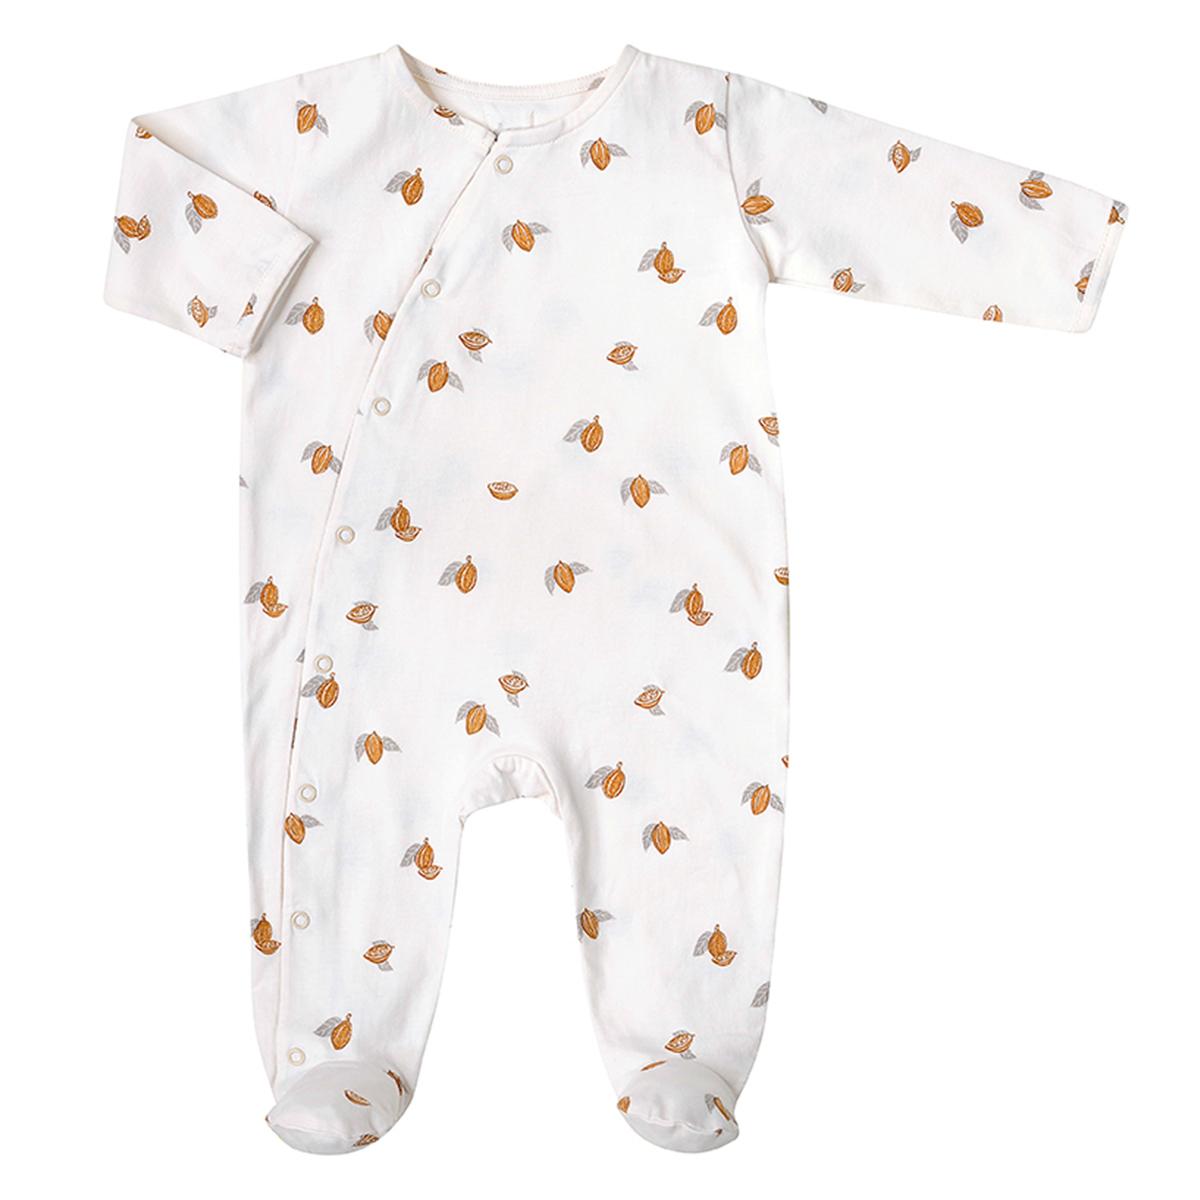 Body & Pyjama Combinaison Jour et Nuit Tonka - 6 Mois Combinaison Jour et Nuit Tonka - 6 Mois